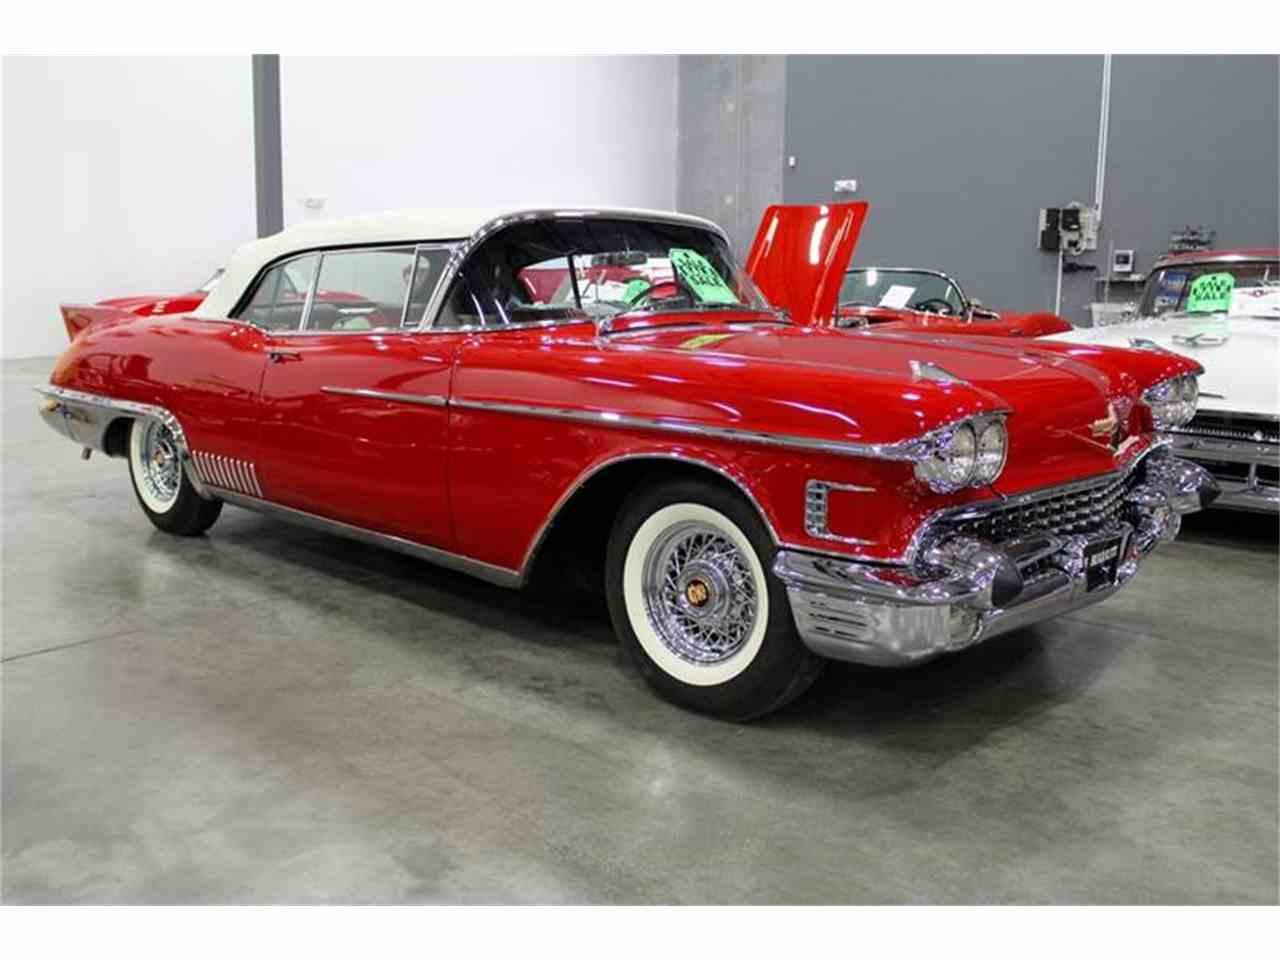 High Resolution Wallpaper | 1958 Cadillac Eldorado Biarritz 1280x960 px